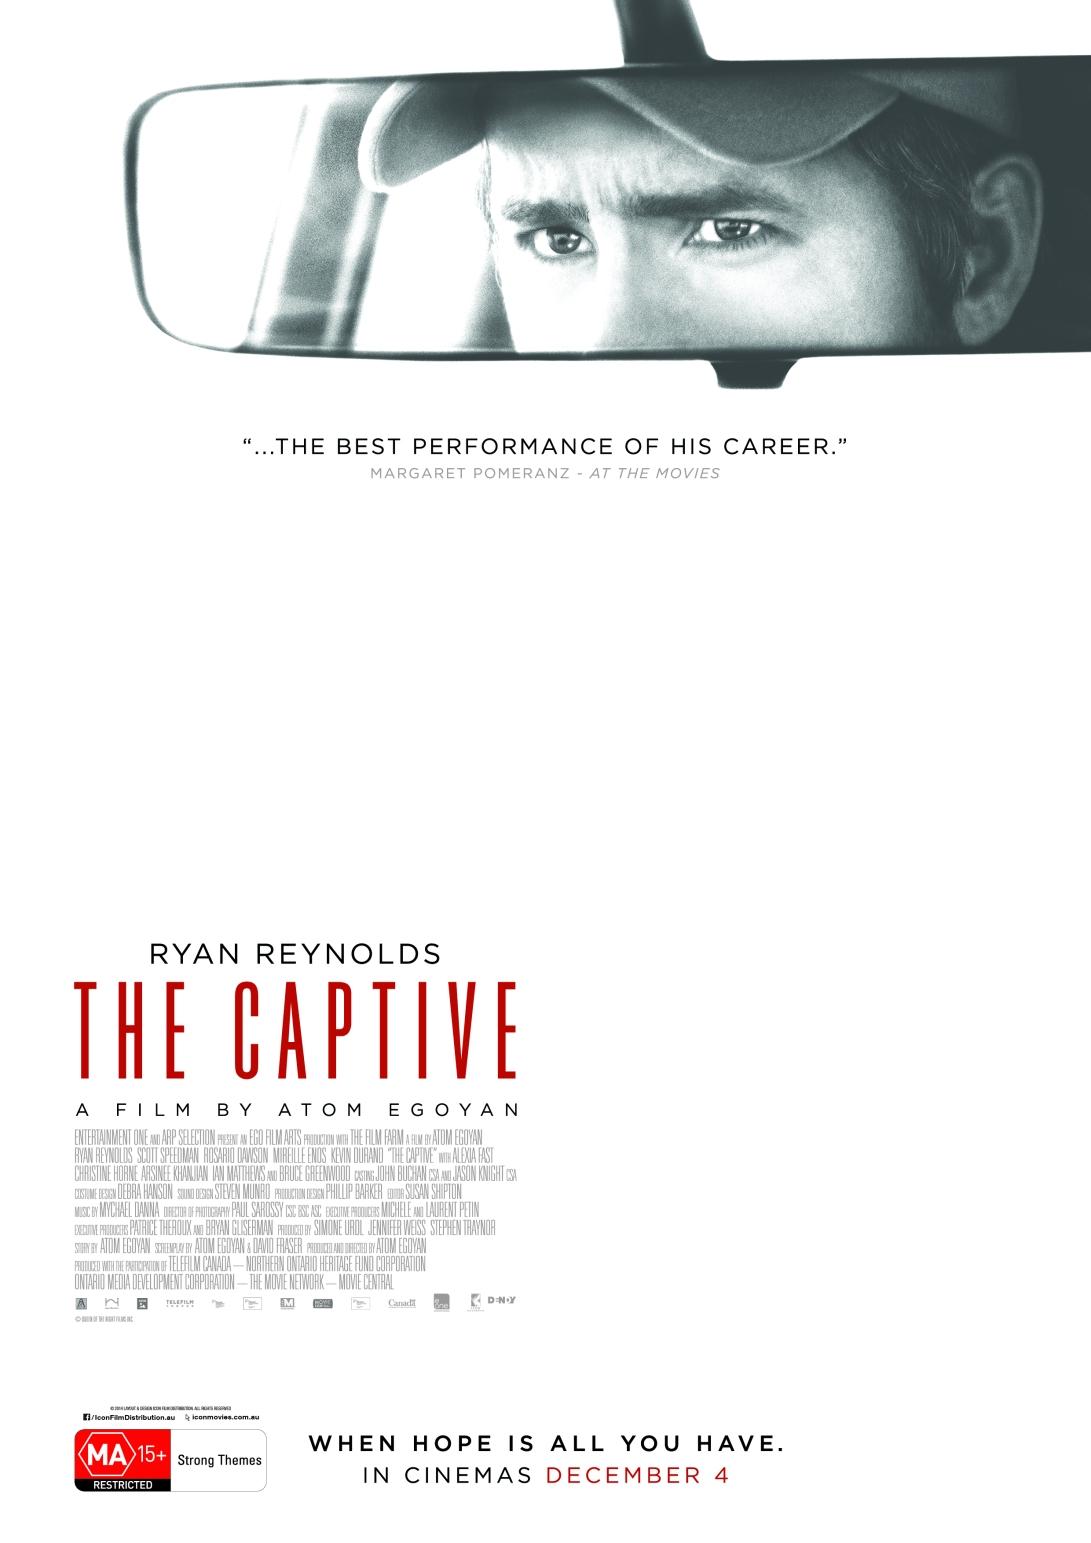 The Captive. 2014. Director Atom Egoyan